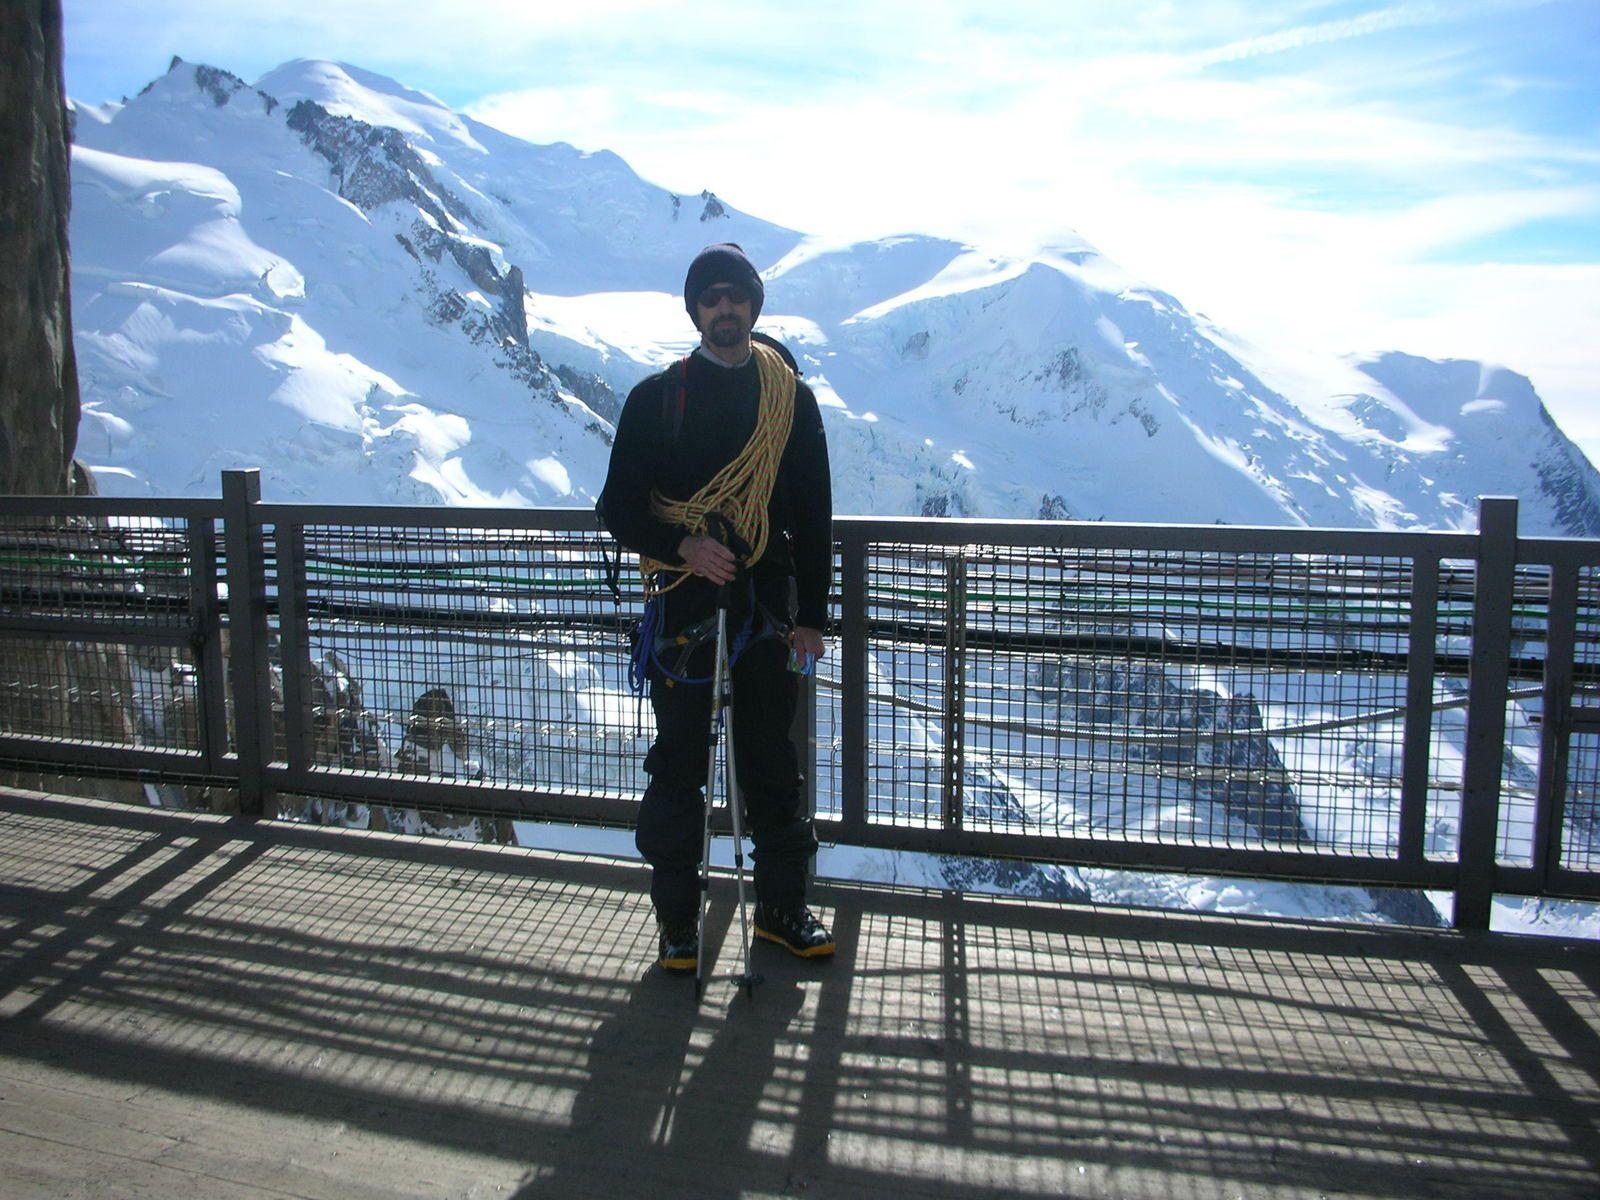 Mont-Blanc du Tacul: Contamine-Négri